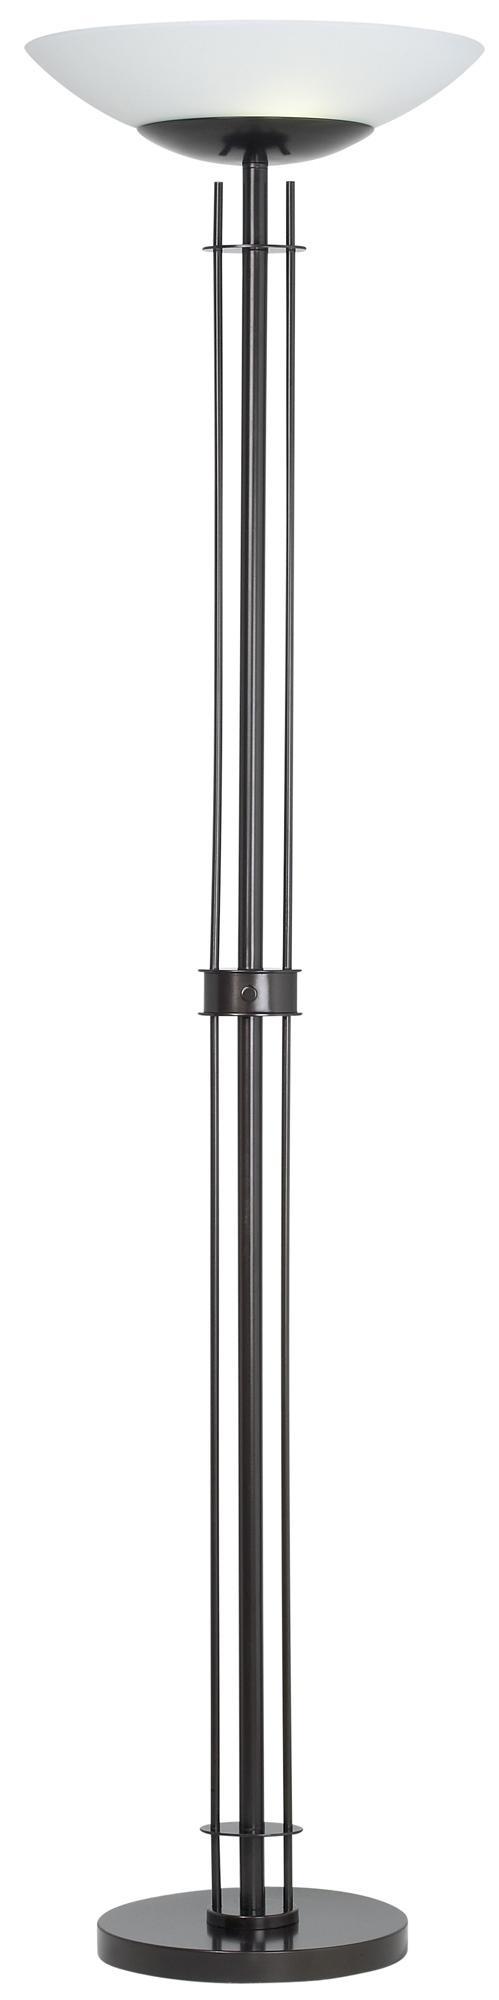 Possini Euro Design Linear Light Blaster Torchiere Lamp | LampsPlus.com